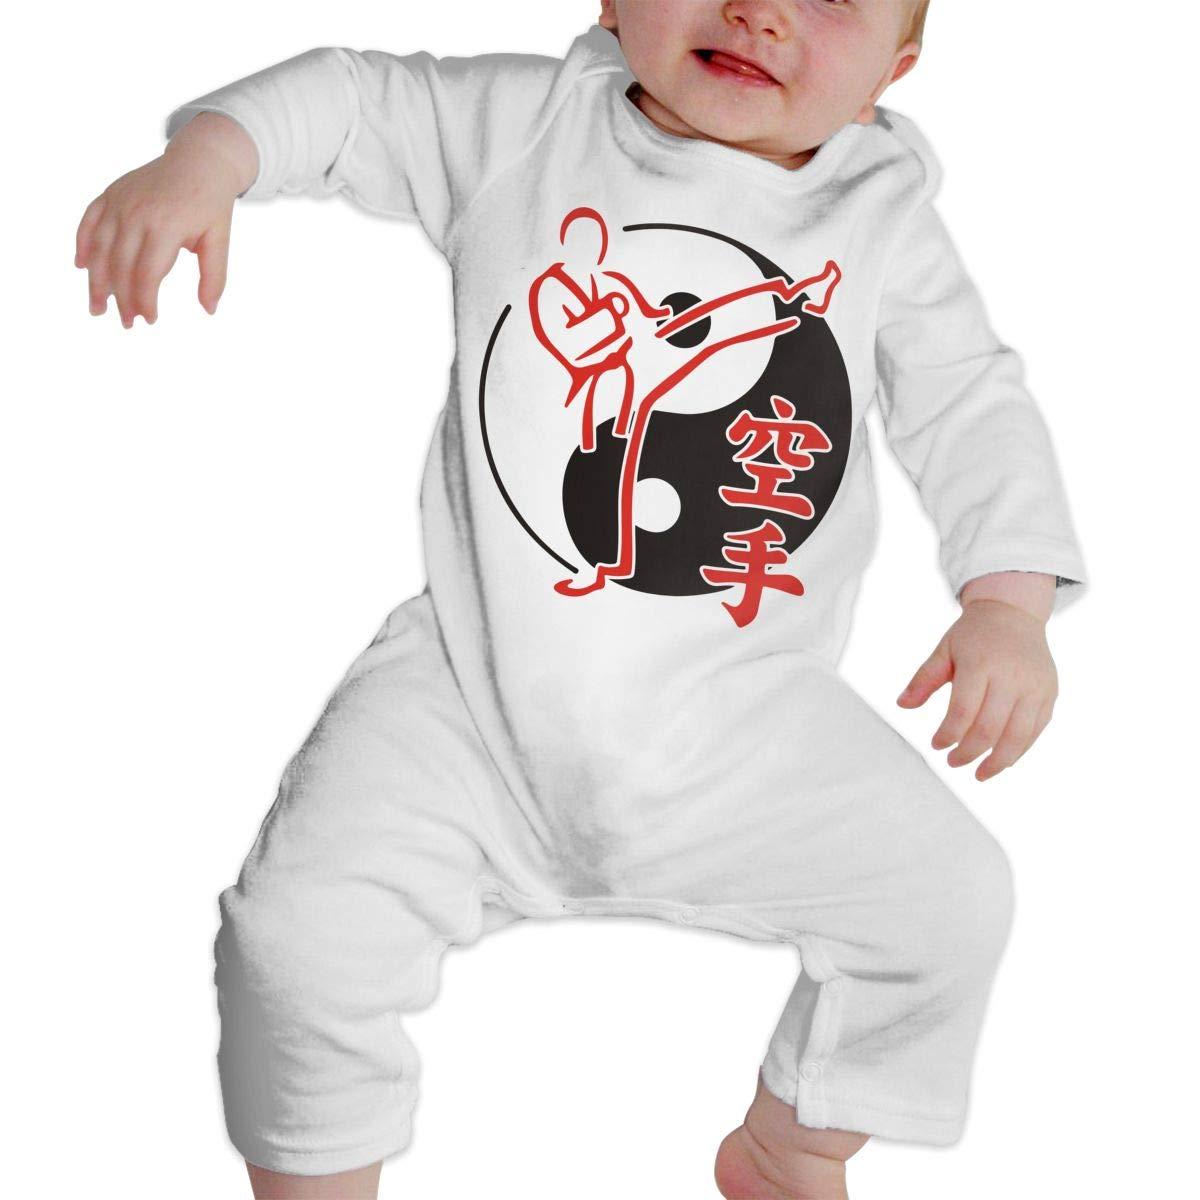 Yin Yang Asian Martial Arts Karate Fighter Toddler Baby Girls Essential Basic Romper Jumpsuit Bodysuit